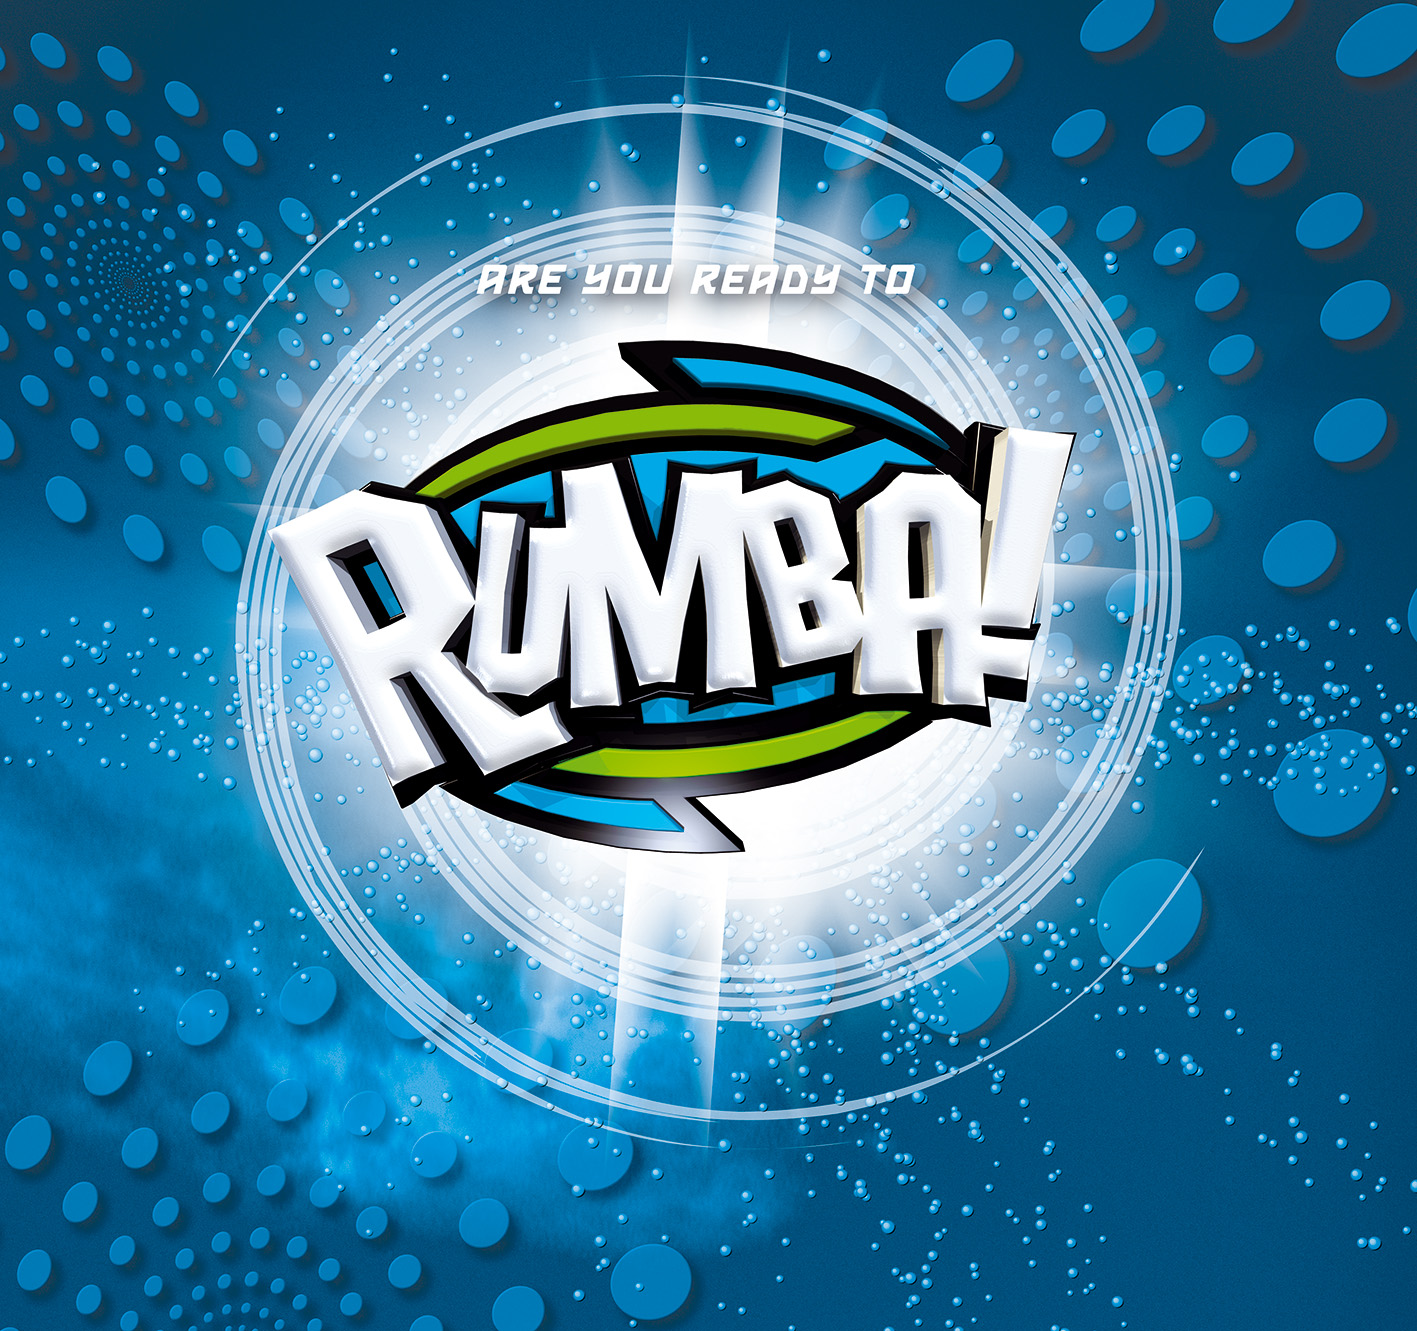 rumba02.jpg